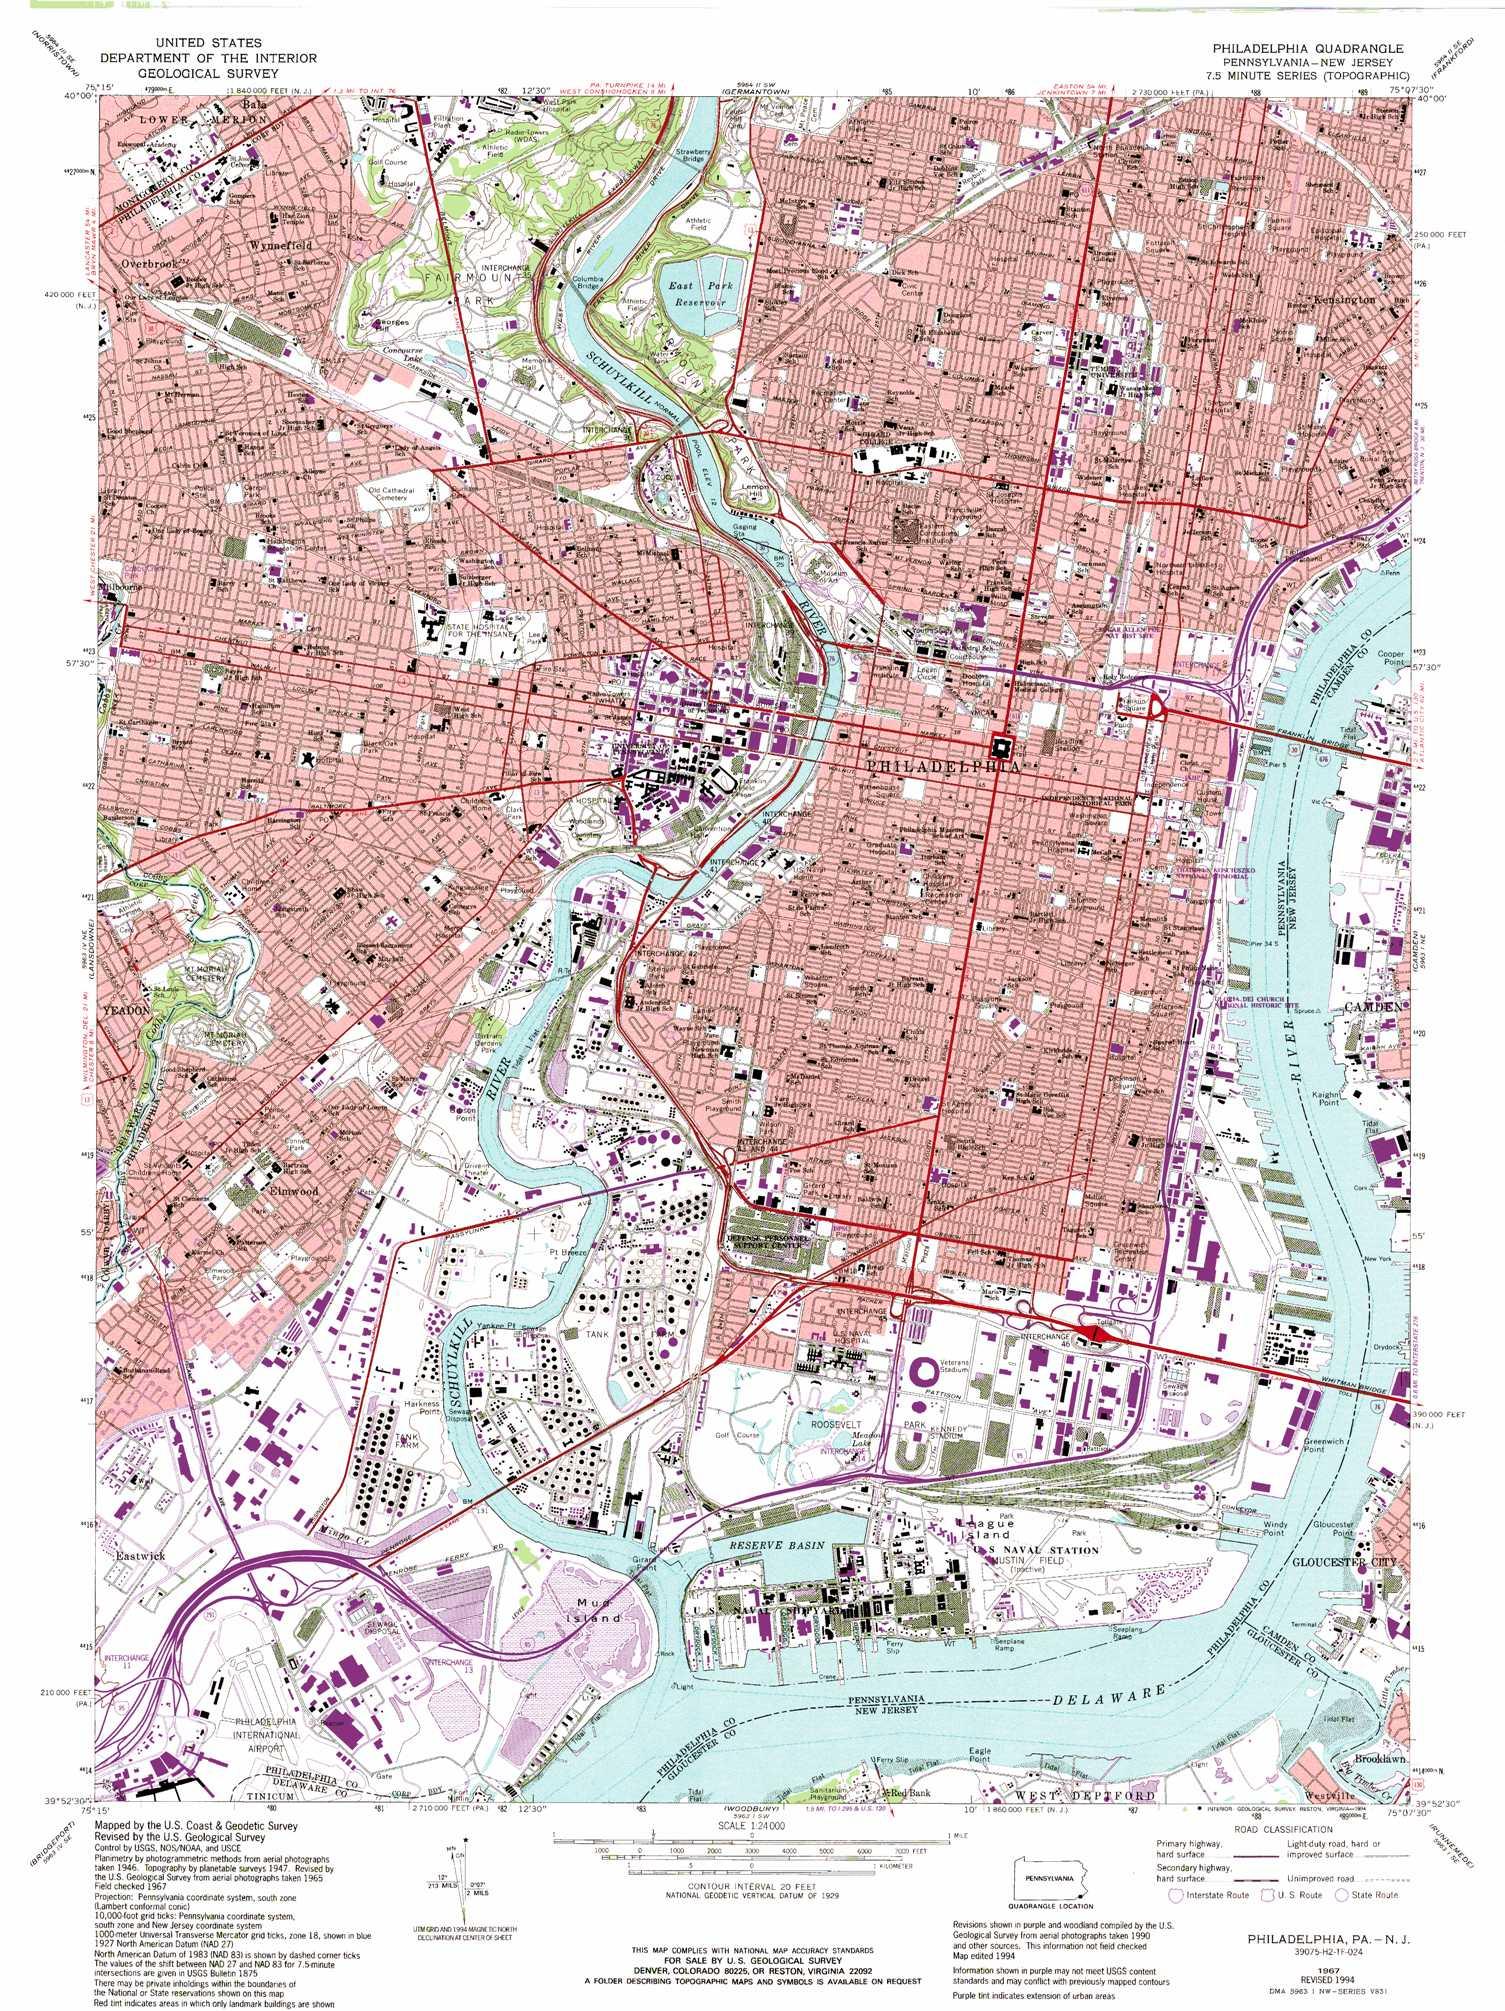 Philadelphia Topographic Map PA NJ USGS Topo Quad H - Philadelphia capital of us origanal map